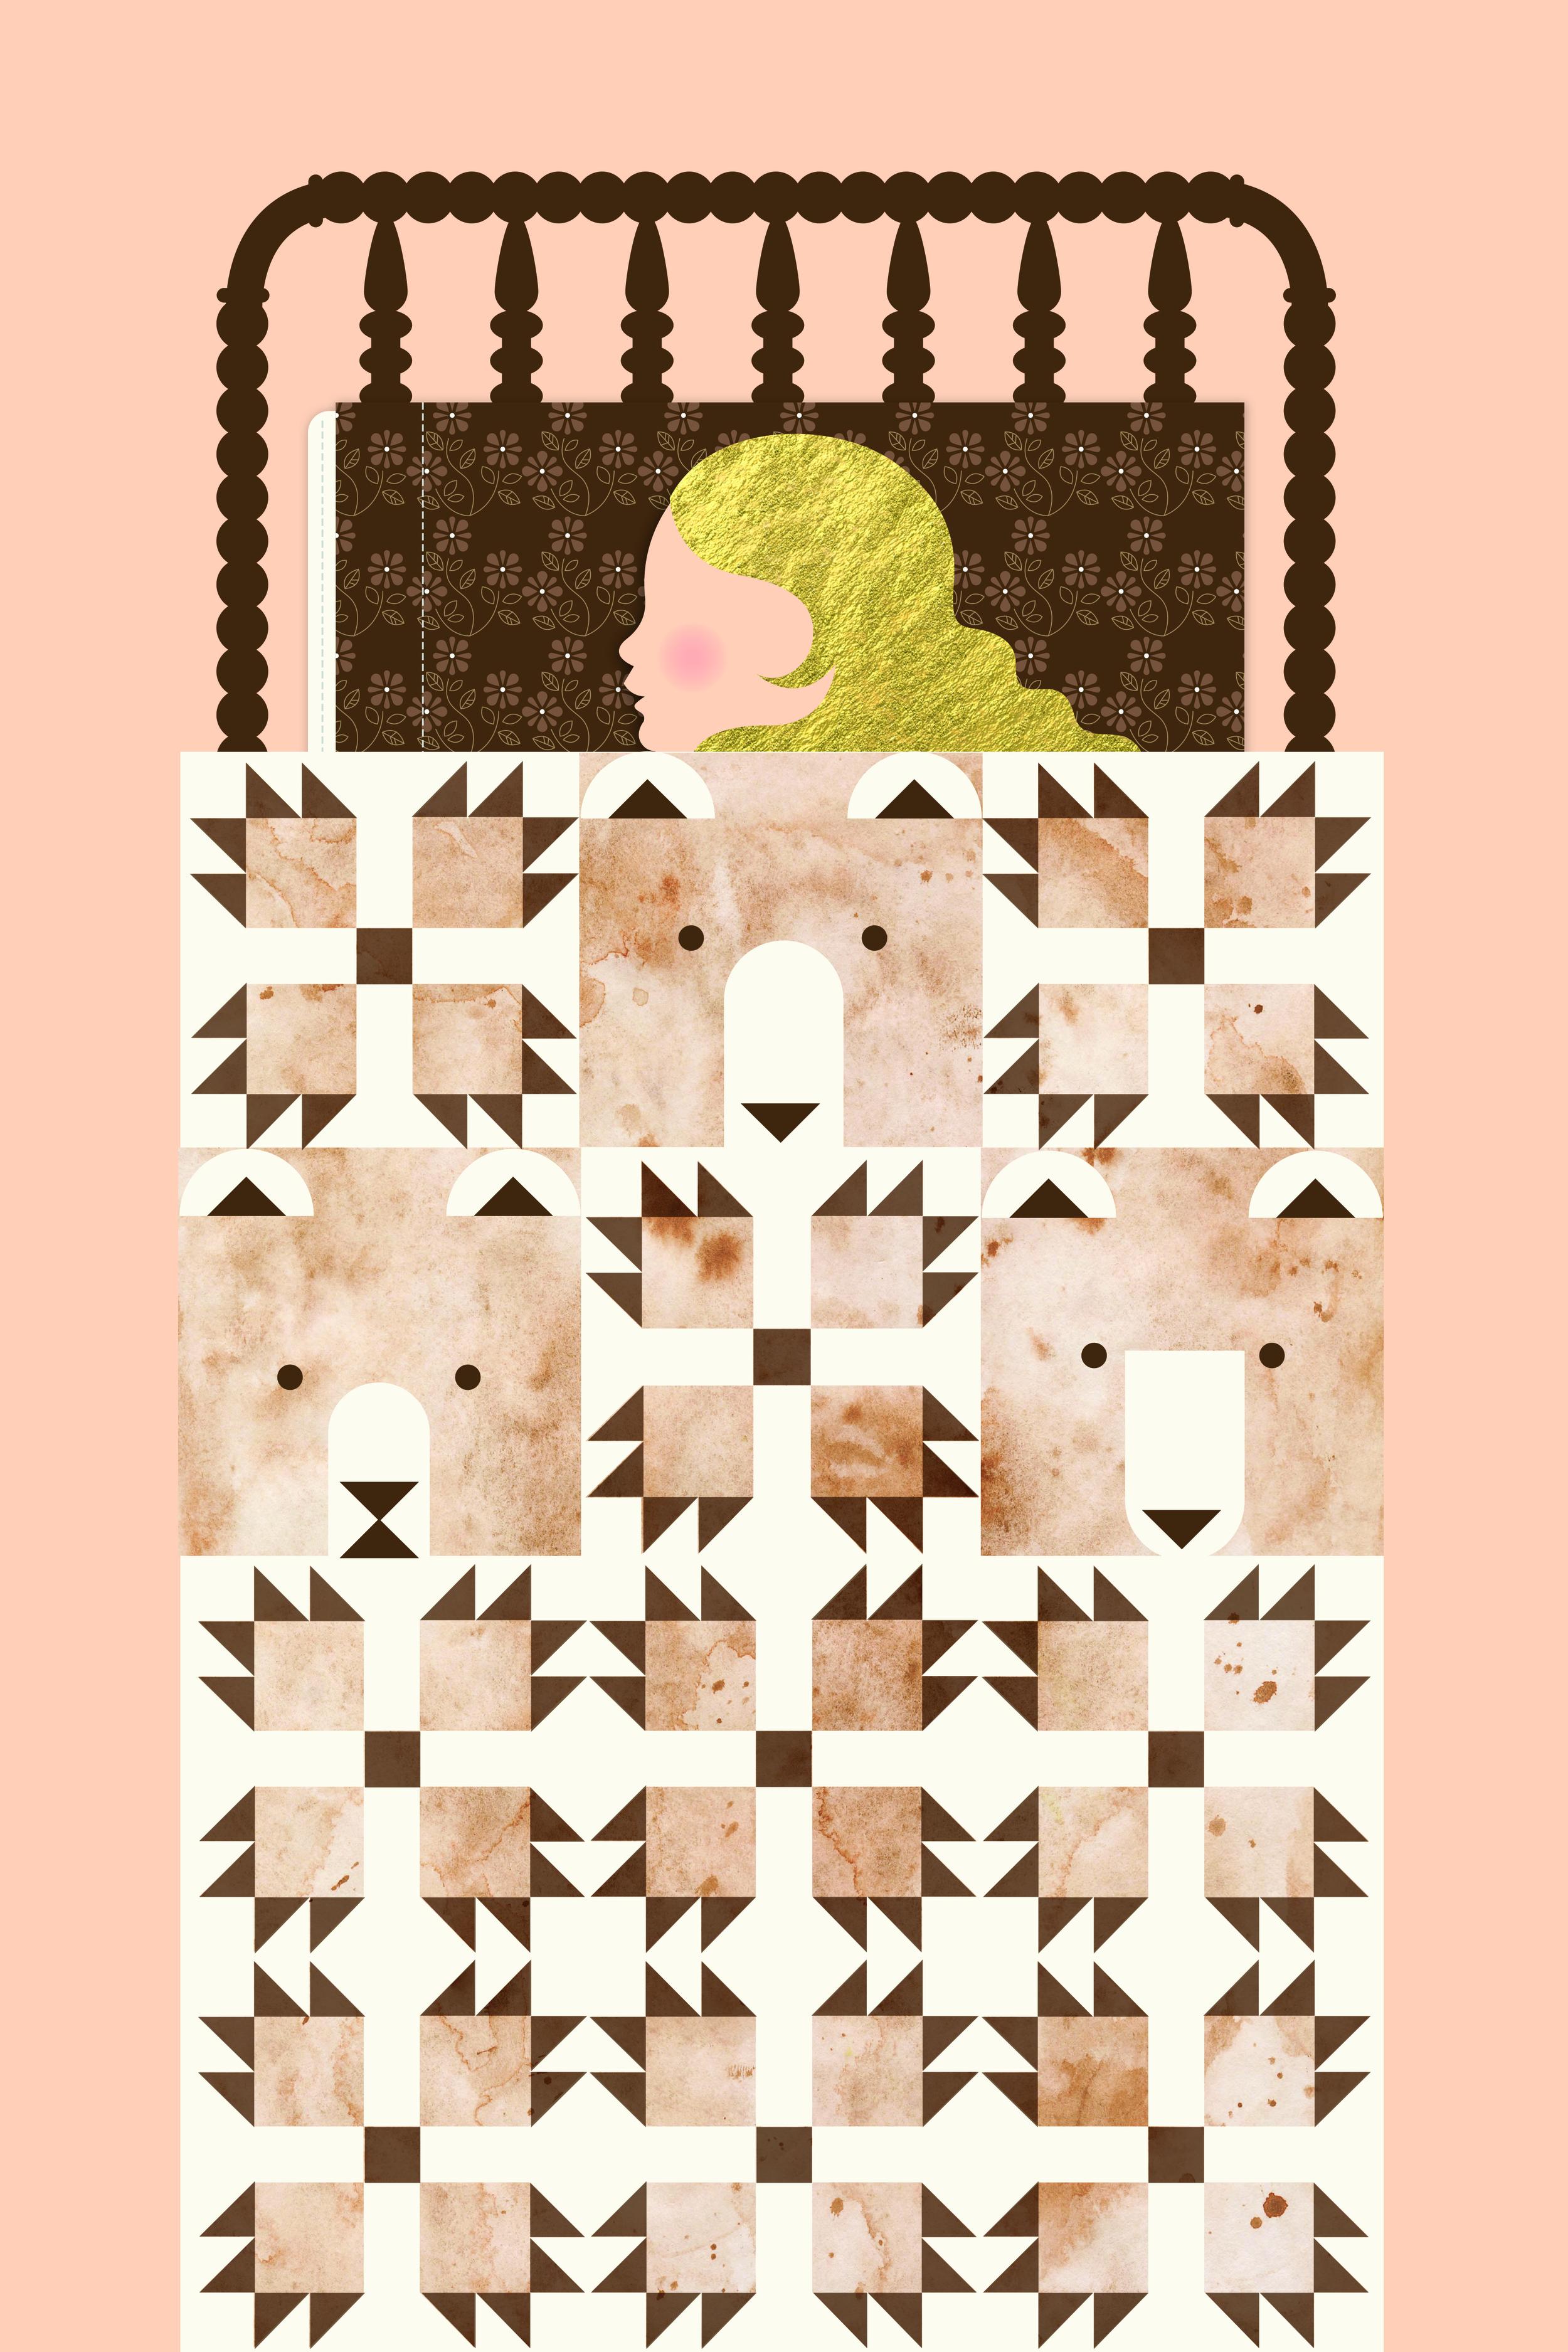 Bedtime Stories: Goldilocks